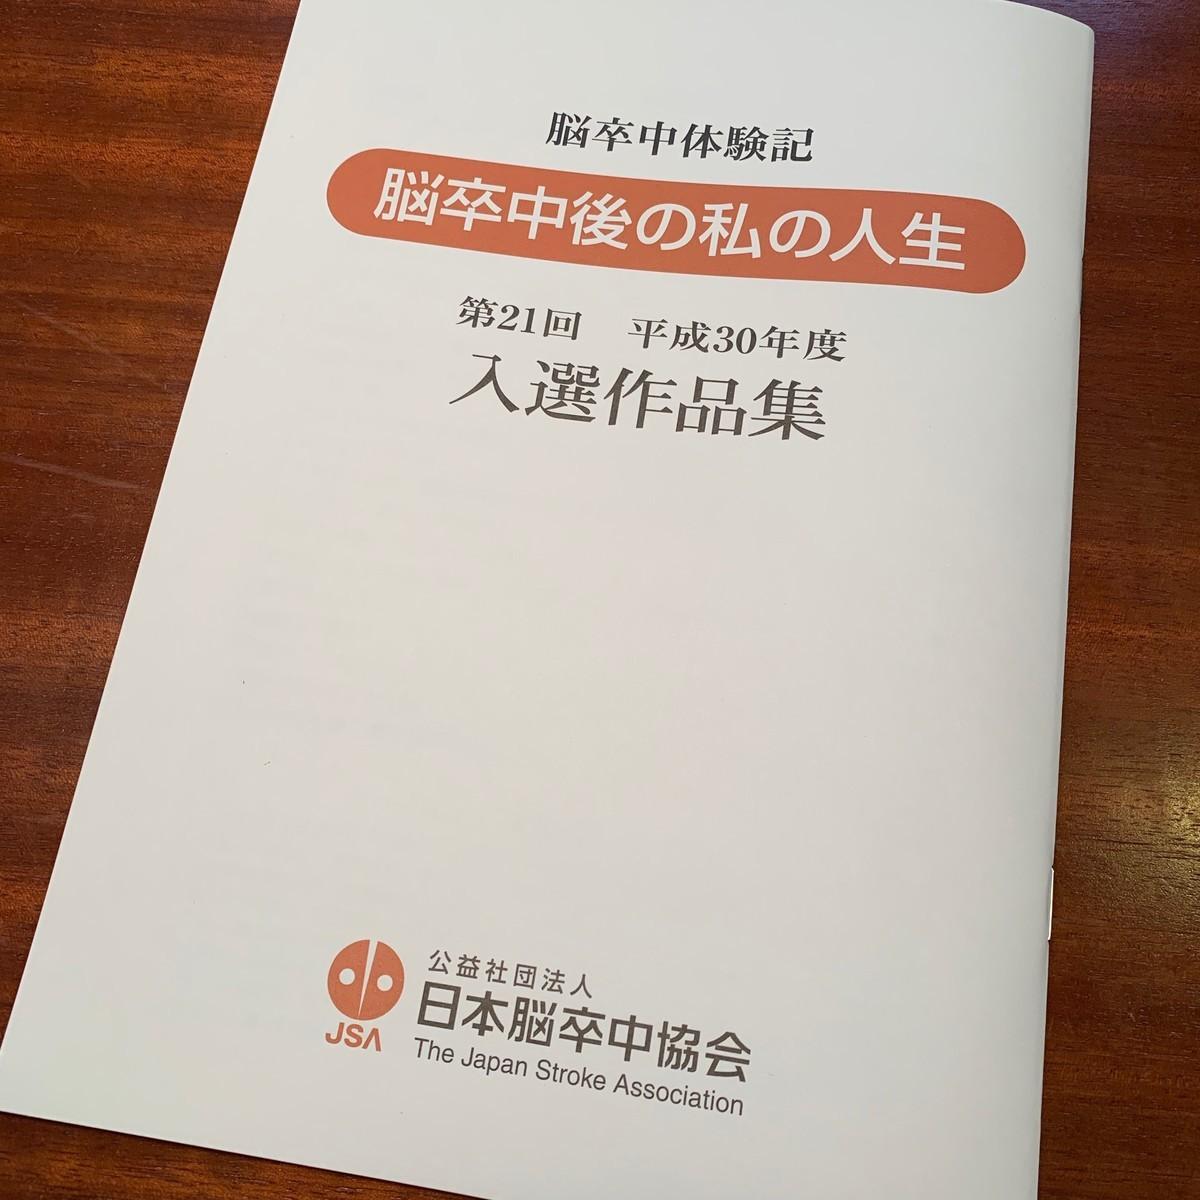 f:id:QianChong:20190630103803j:plain:w400